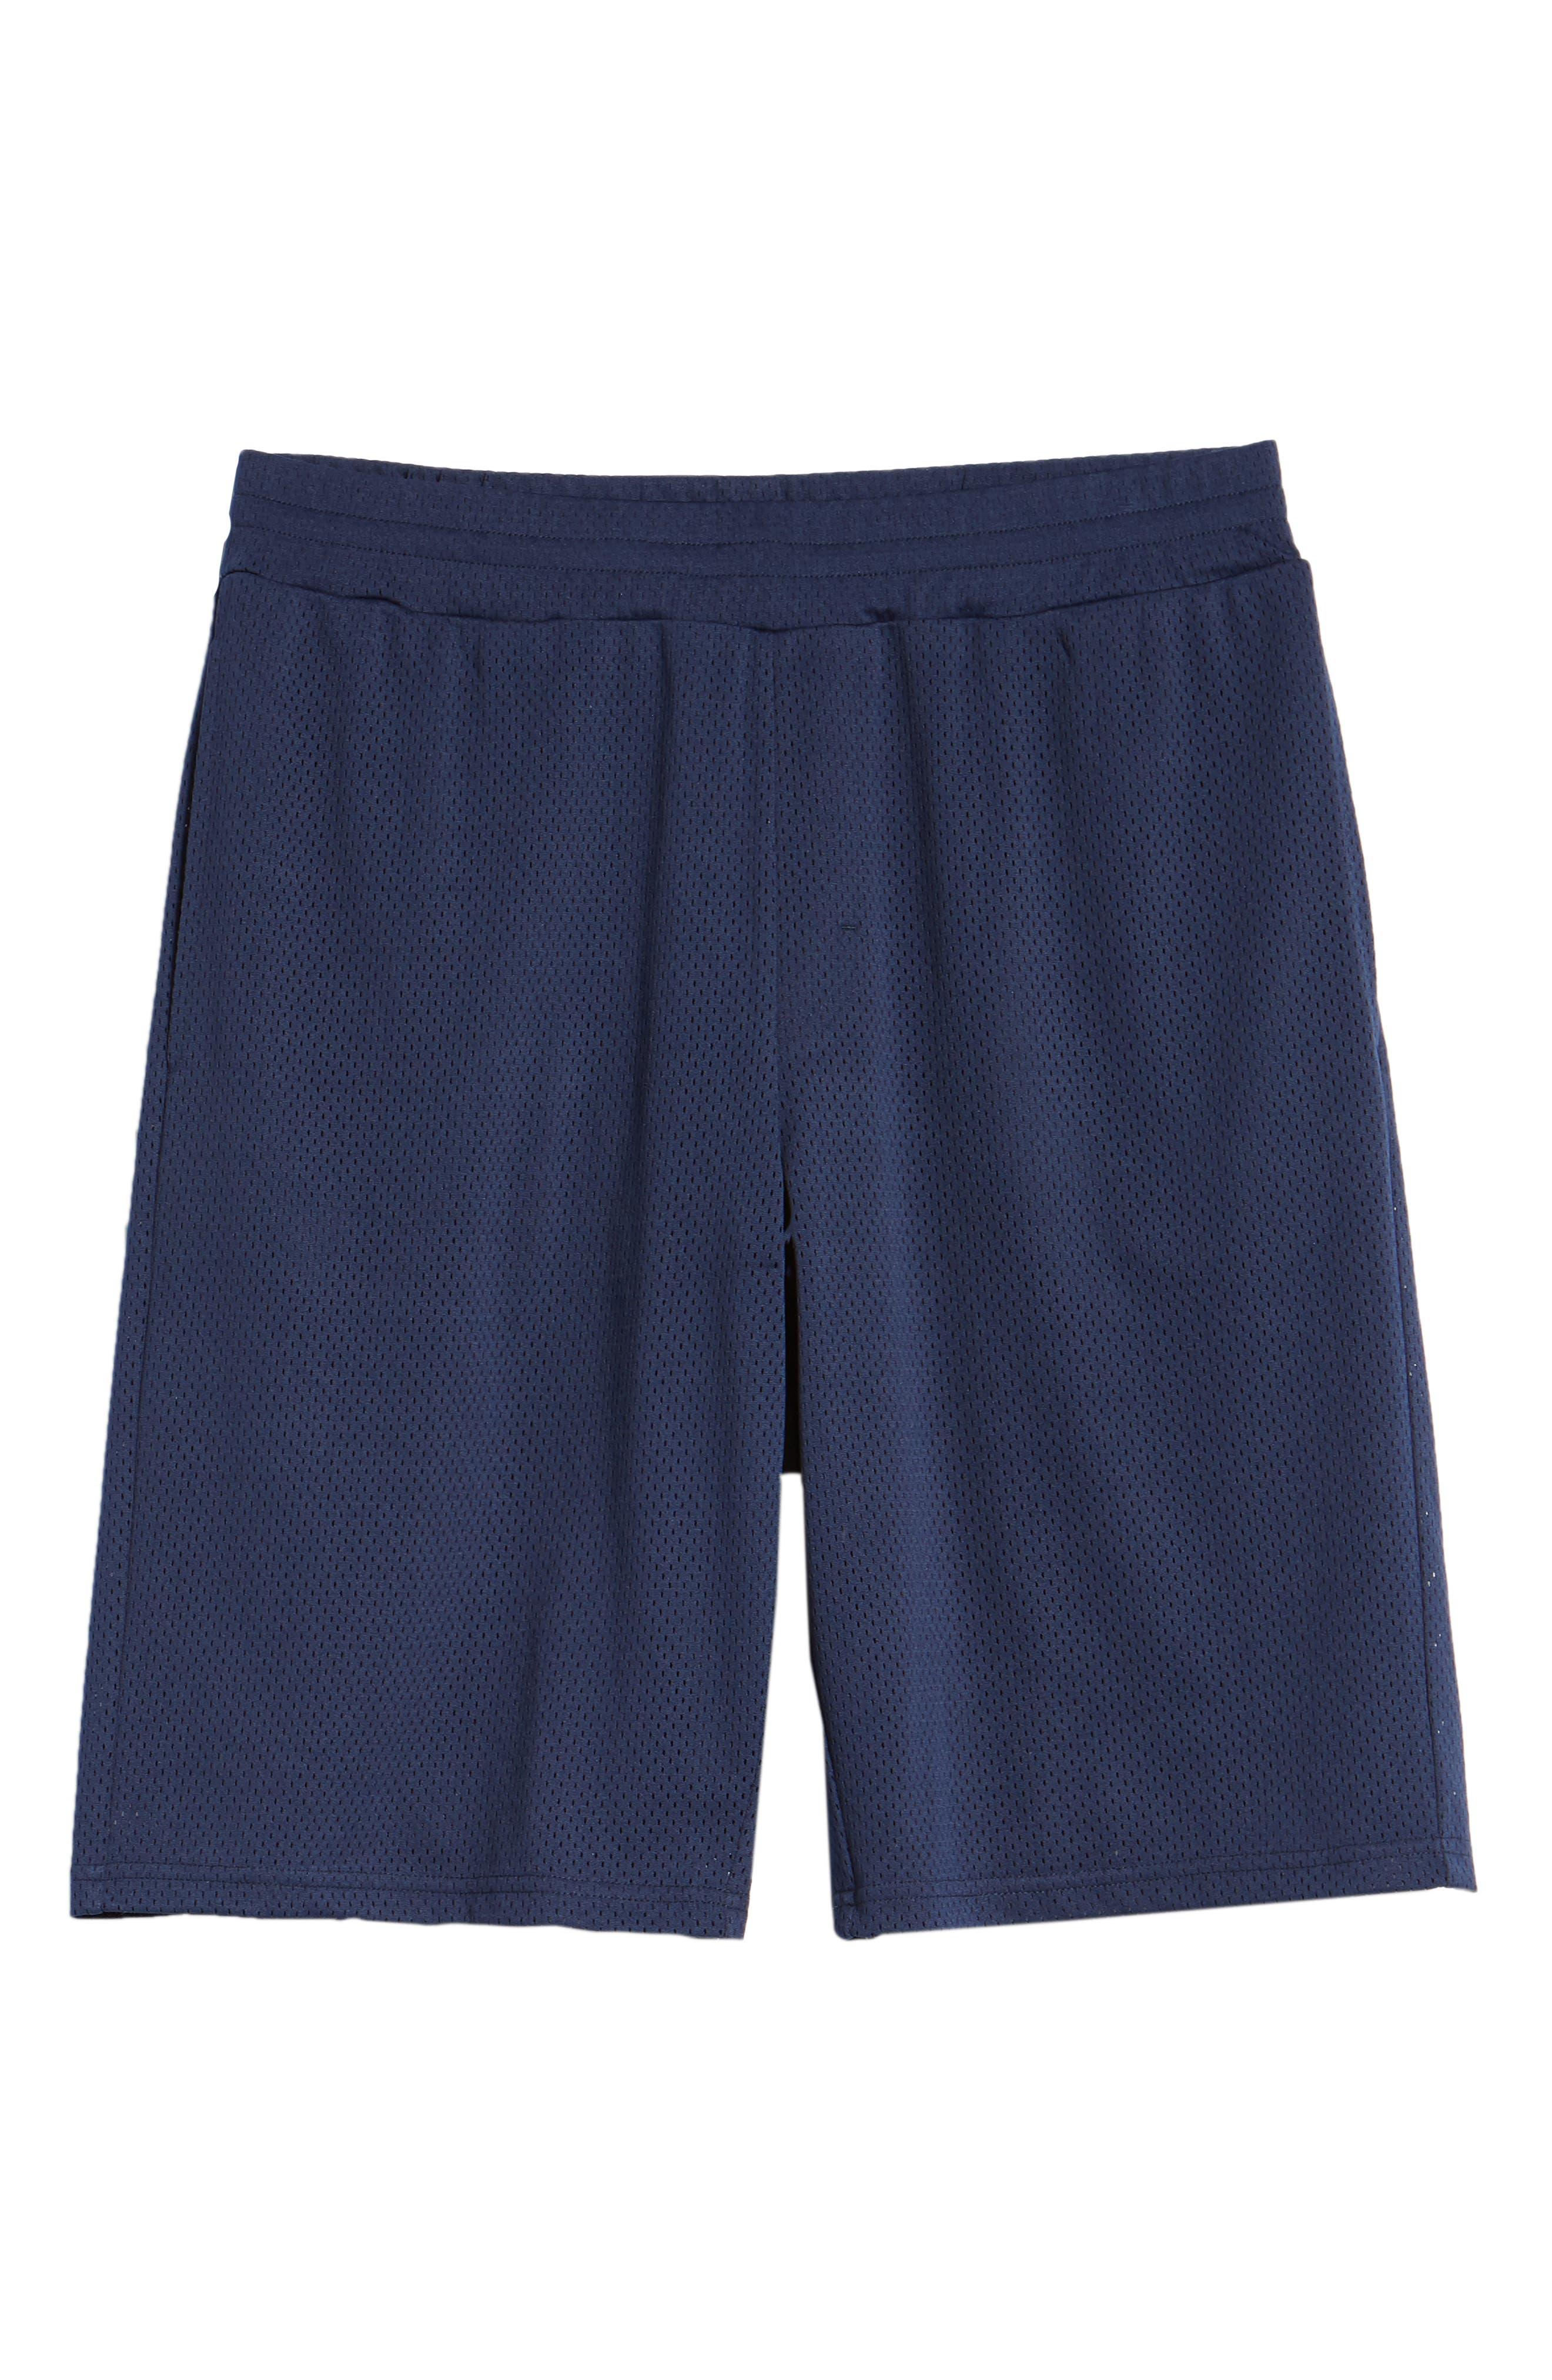 Basketball Shorts,                             Alternate thumbnail 6, color,                             NAVY PEACOAT